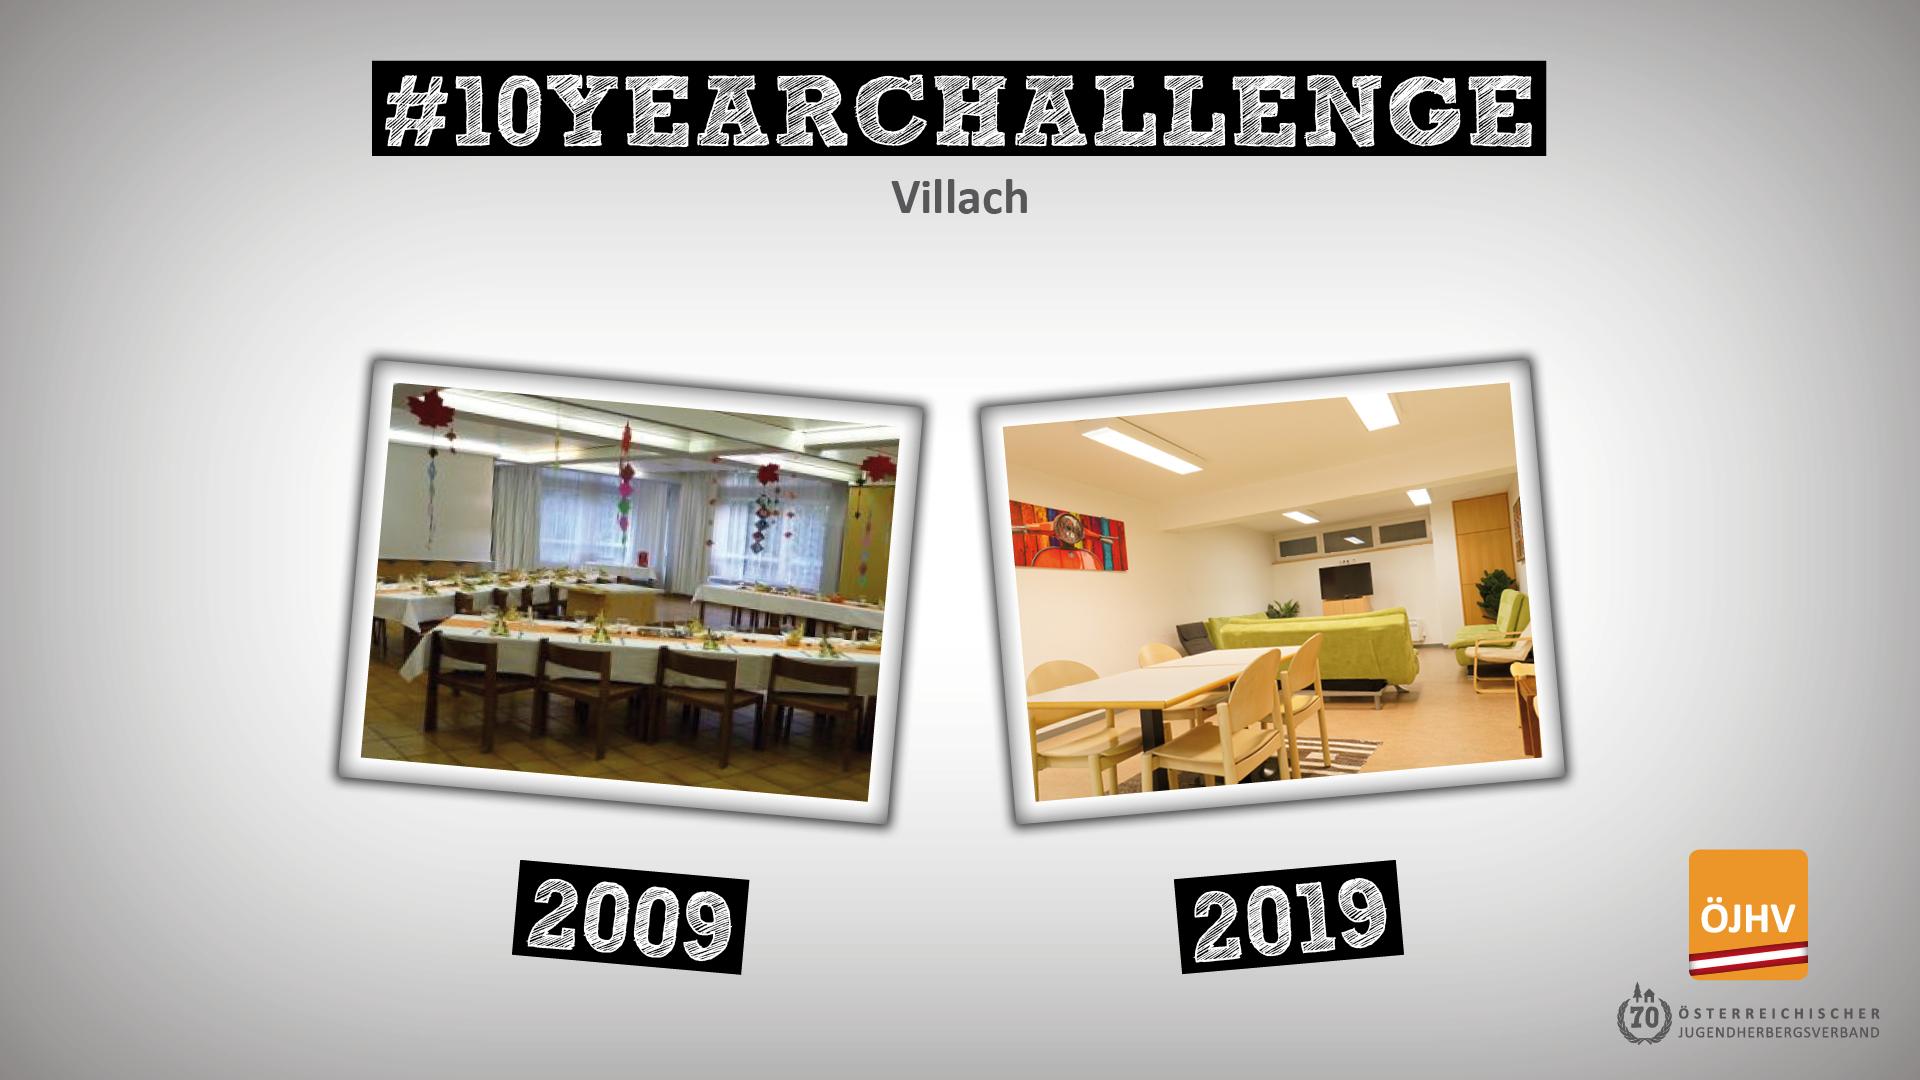 Jugendherbergsverband #10YearChallenge Villach